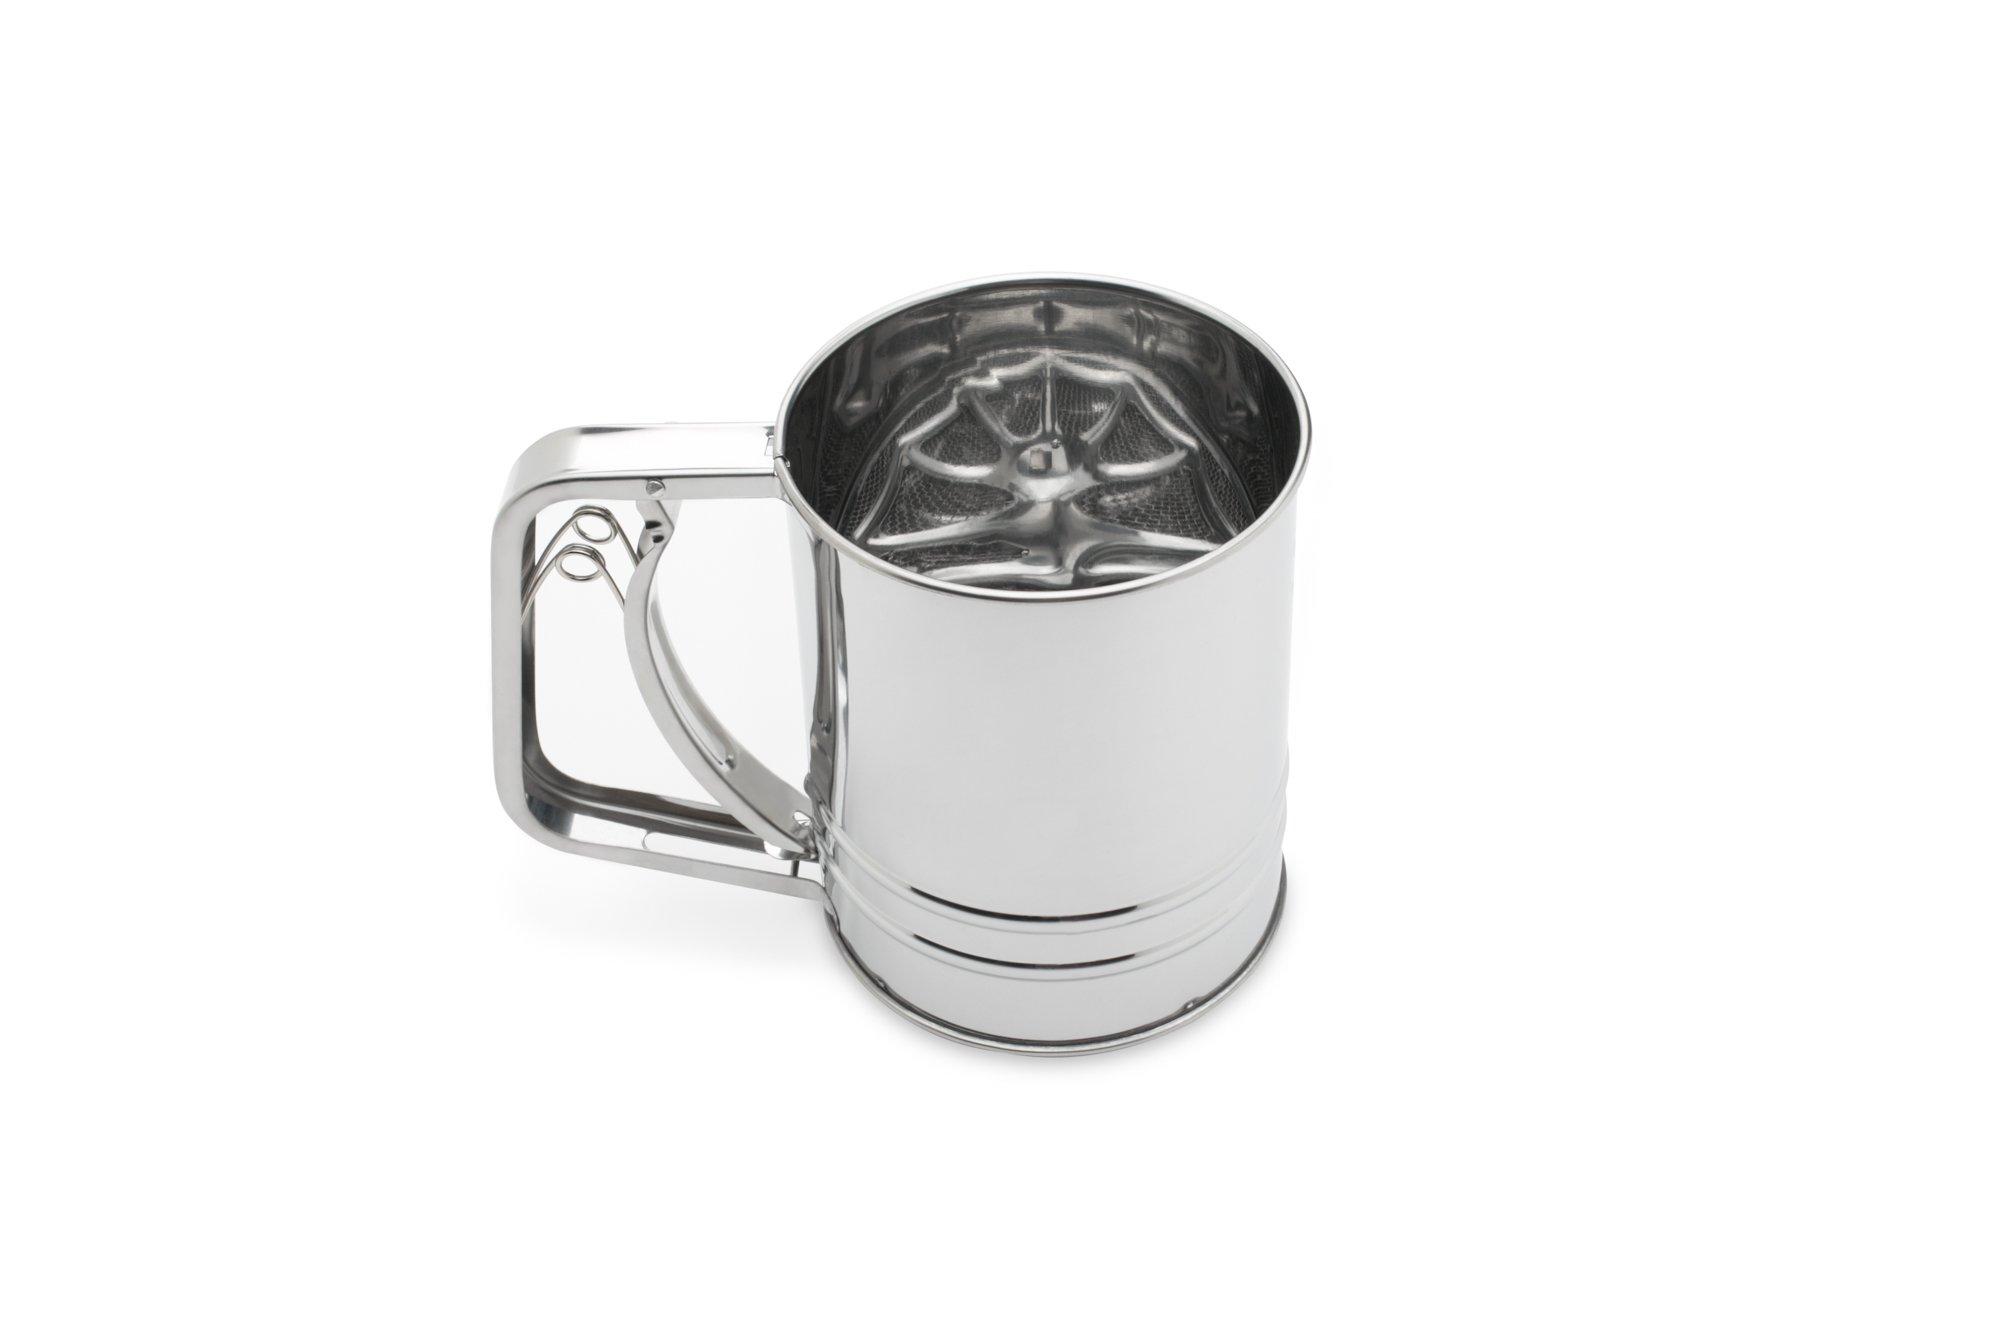 Fox Run 4653 Flour Sifter, Stainless Steel, 3-Cup